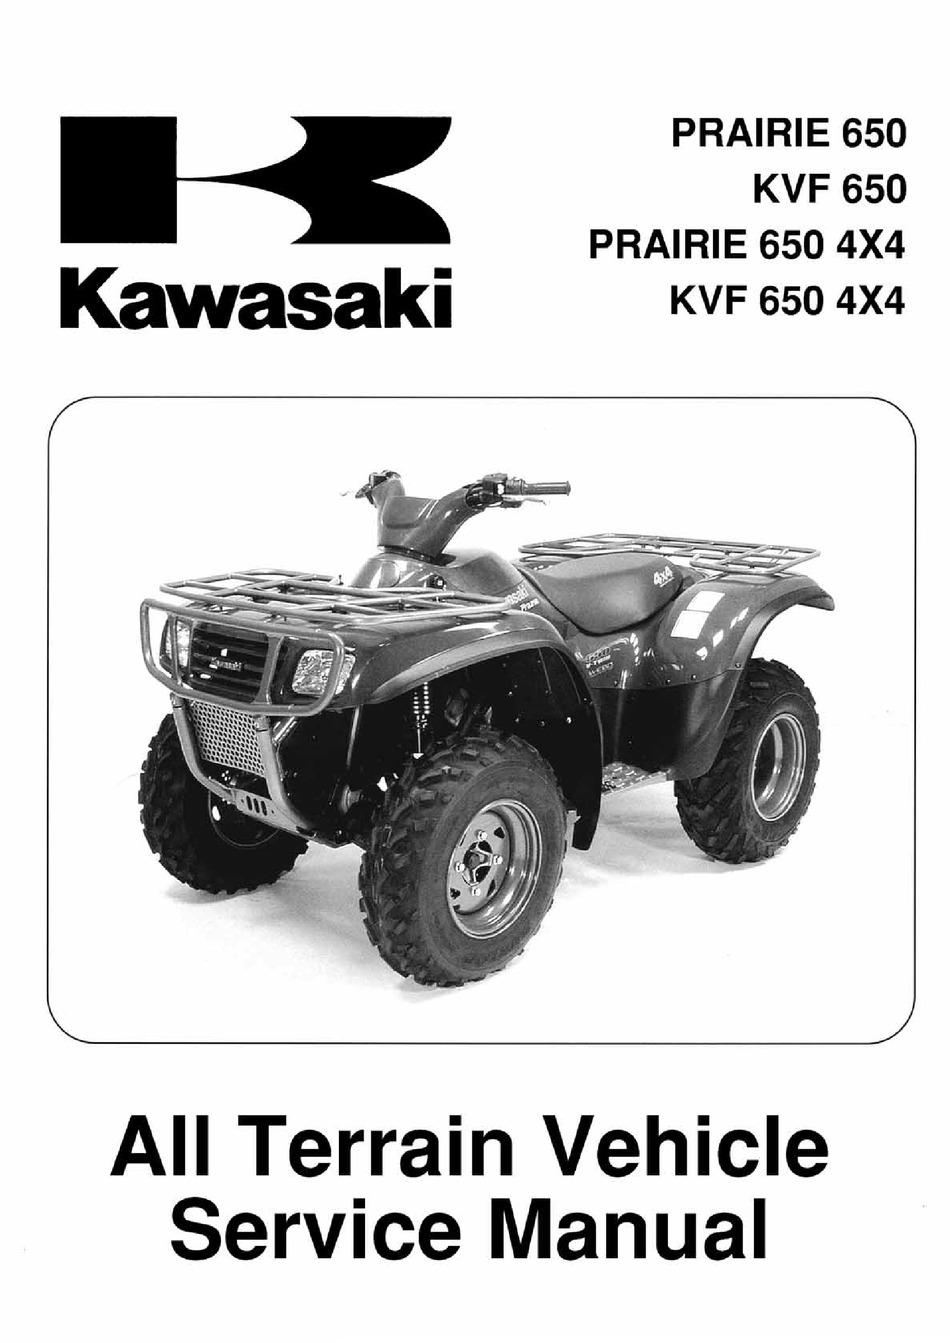 Kawasaki Prairie 650 Service Manual Pdf Download Manualslib